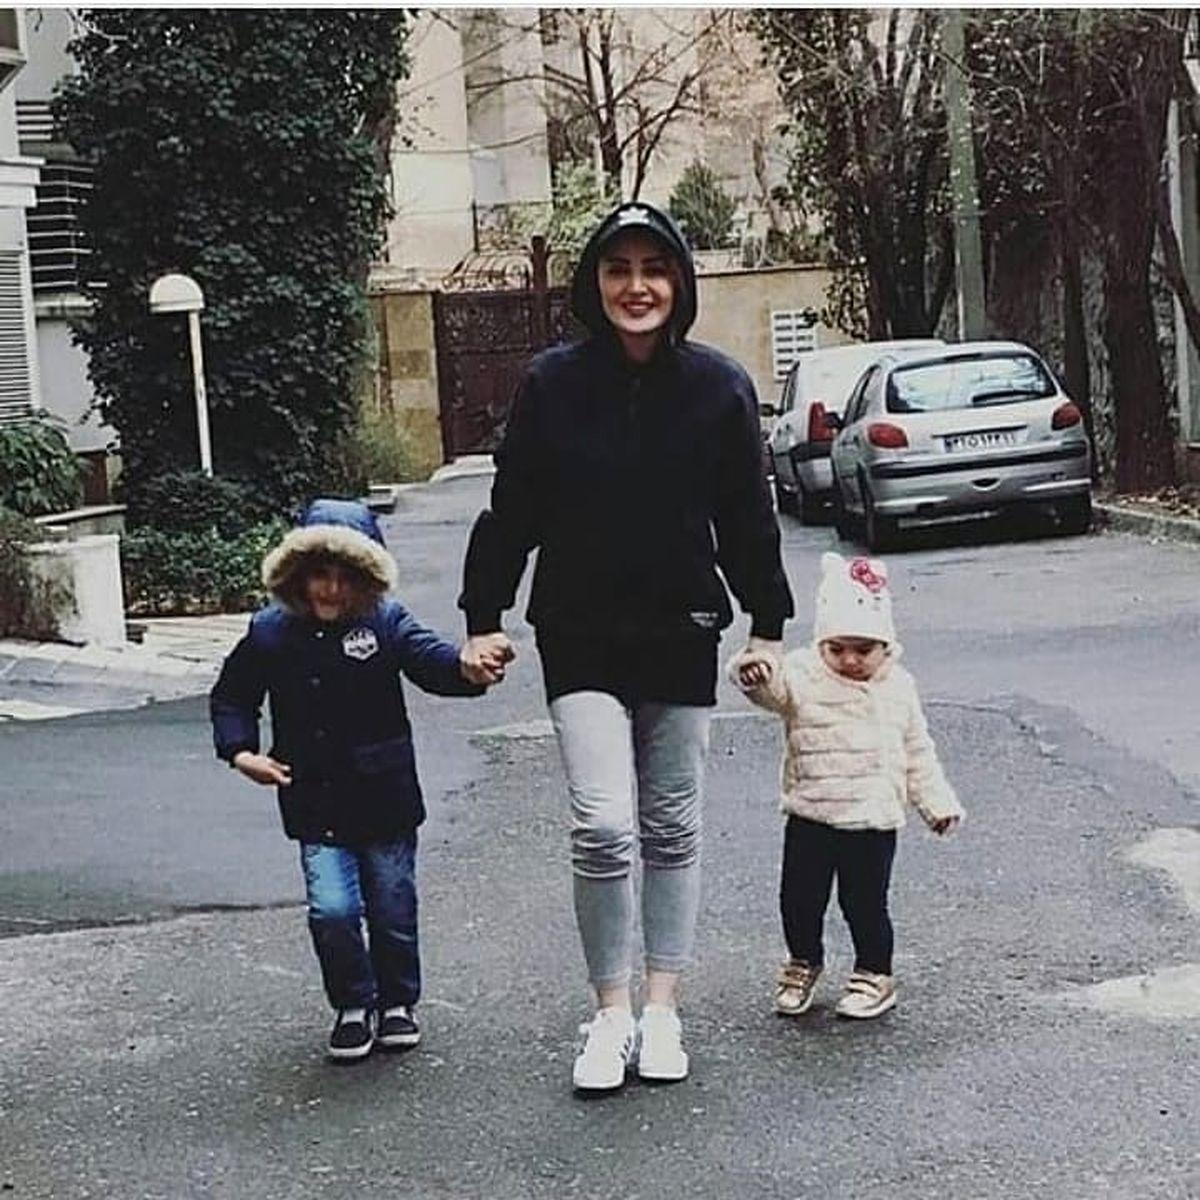 تیپ نامتعارف شیلا خداداد مقابل خانه + عکس